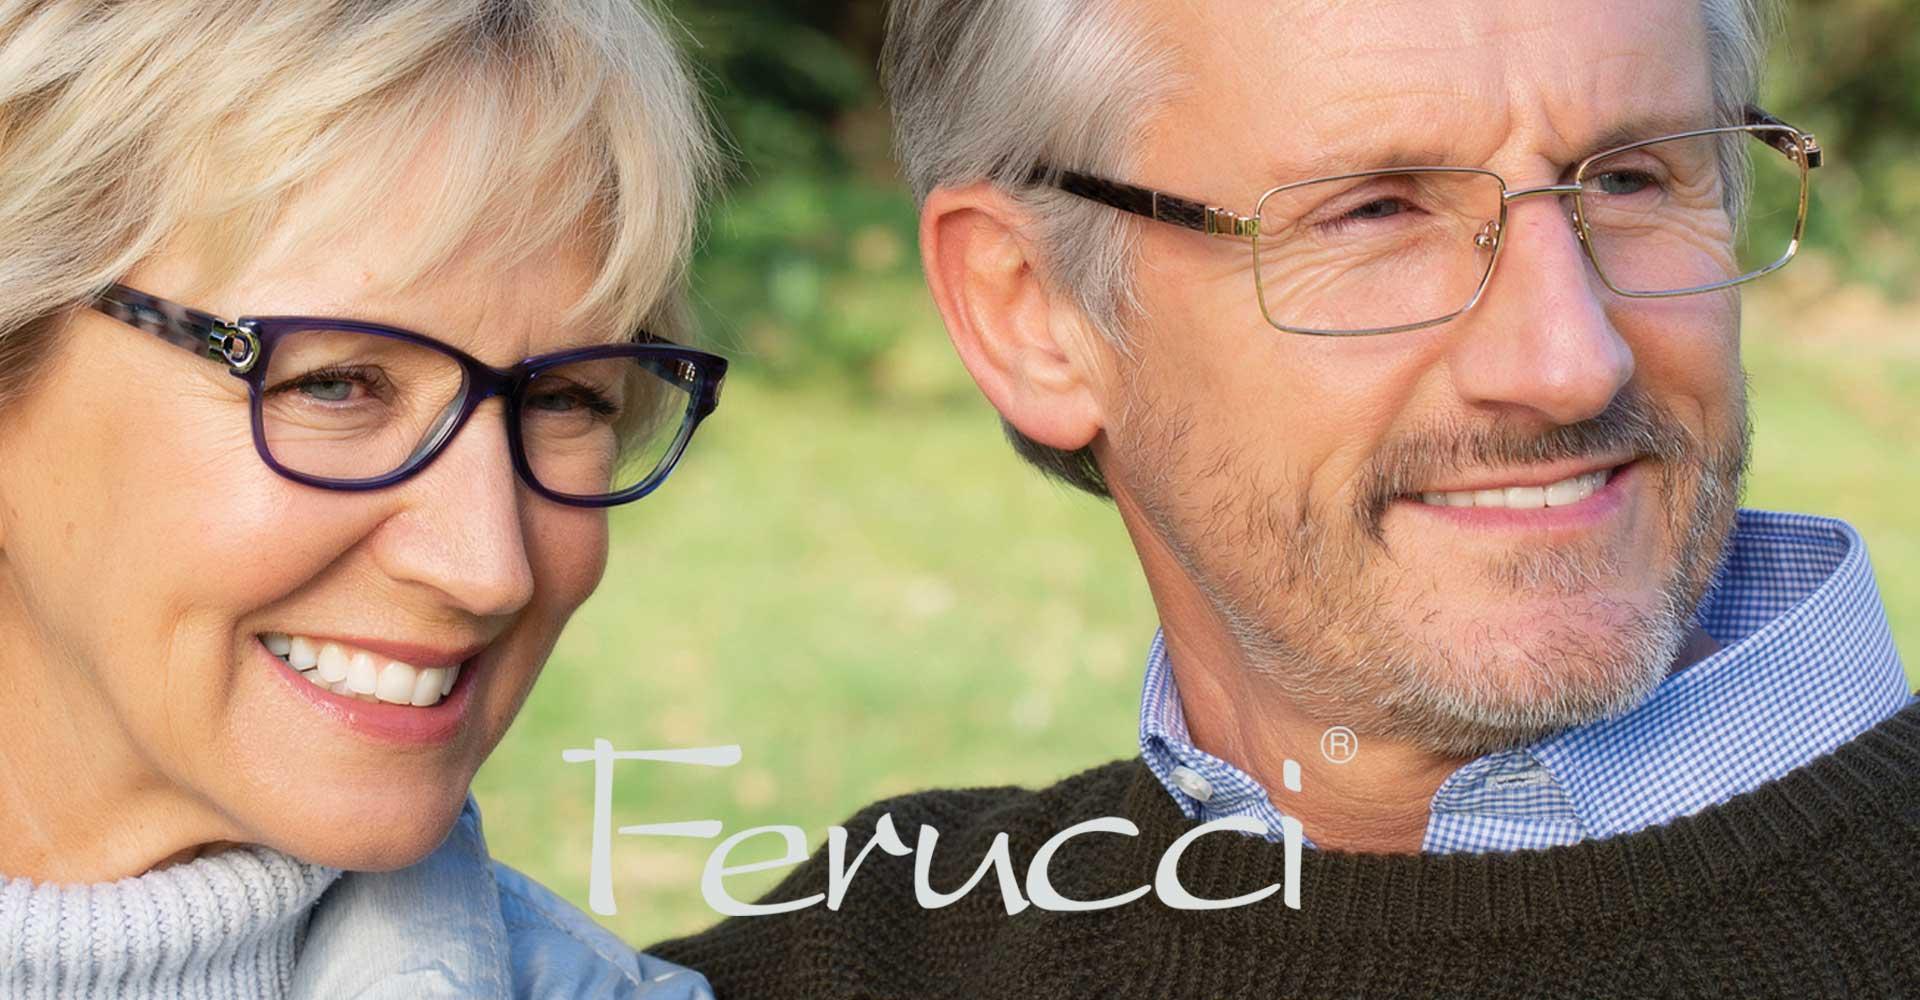 2019-Ferucci-Web-Banners